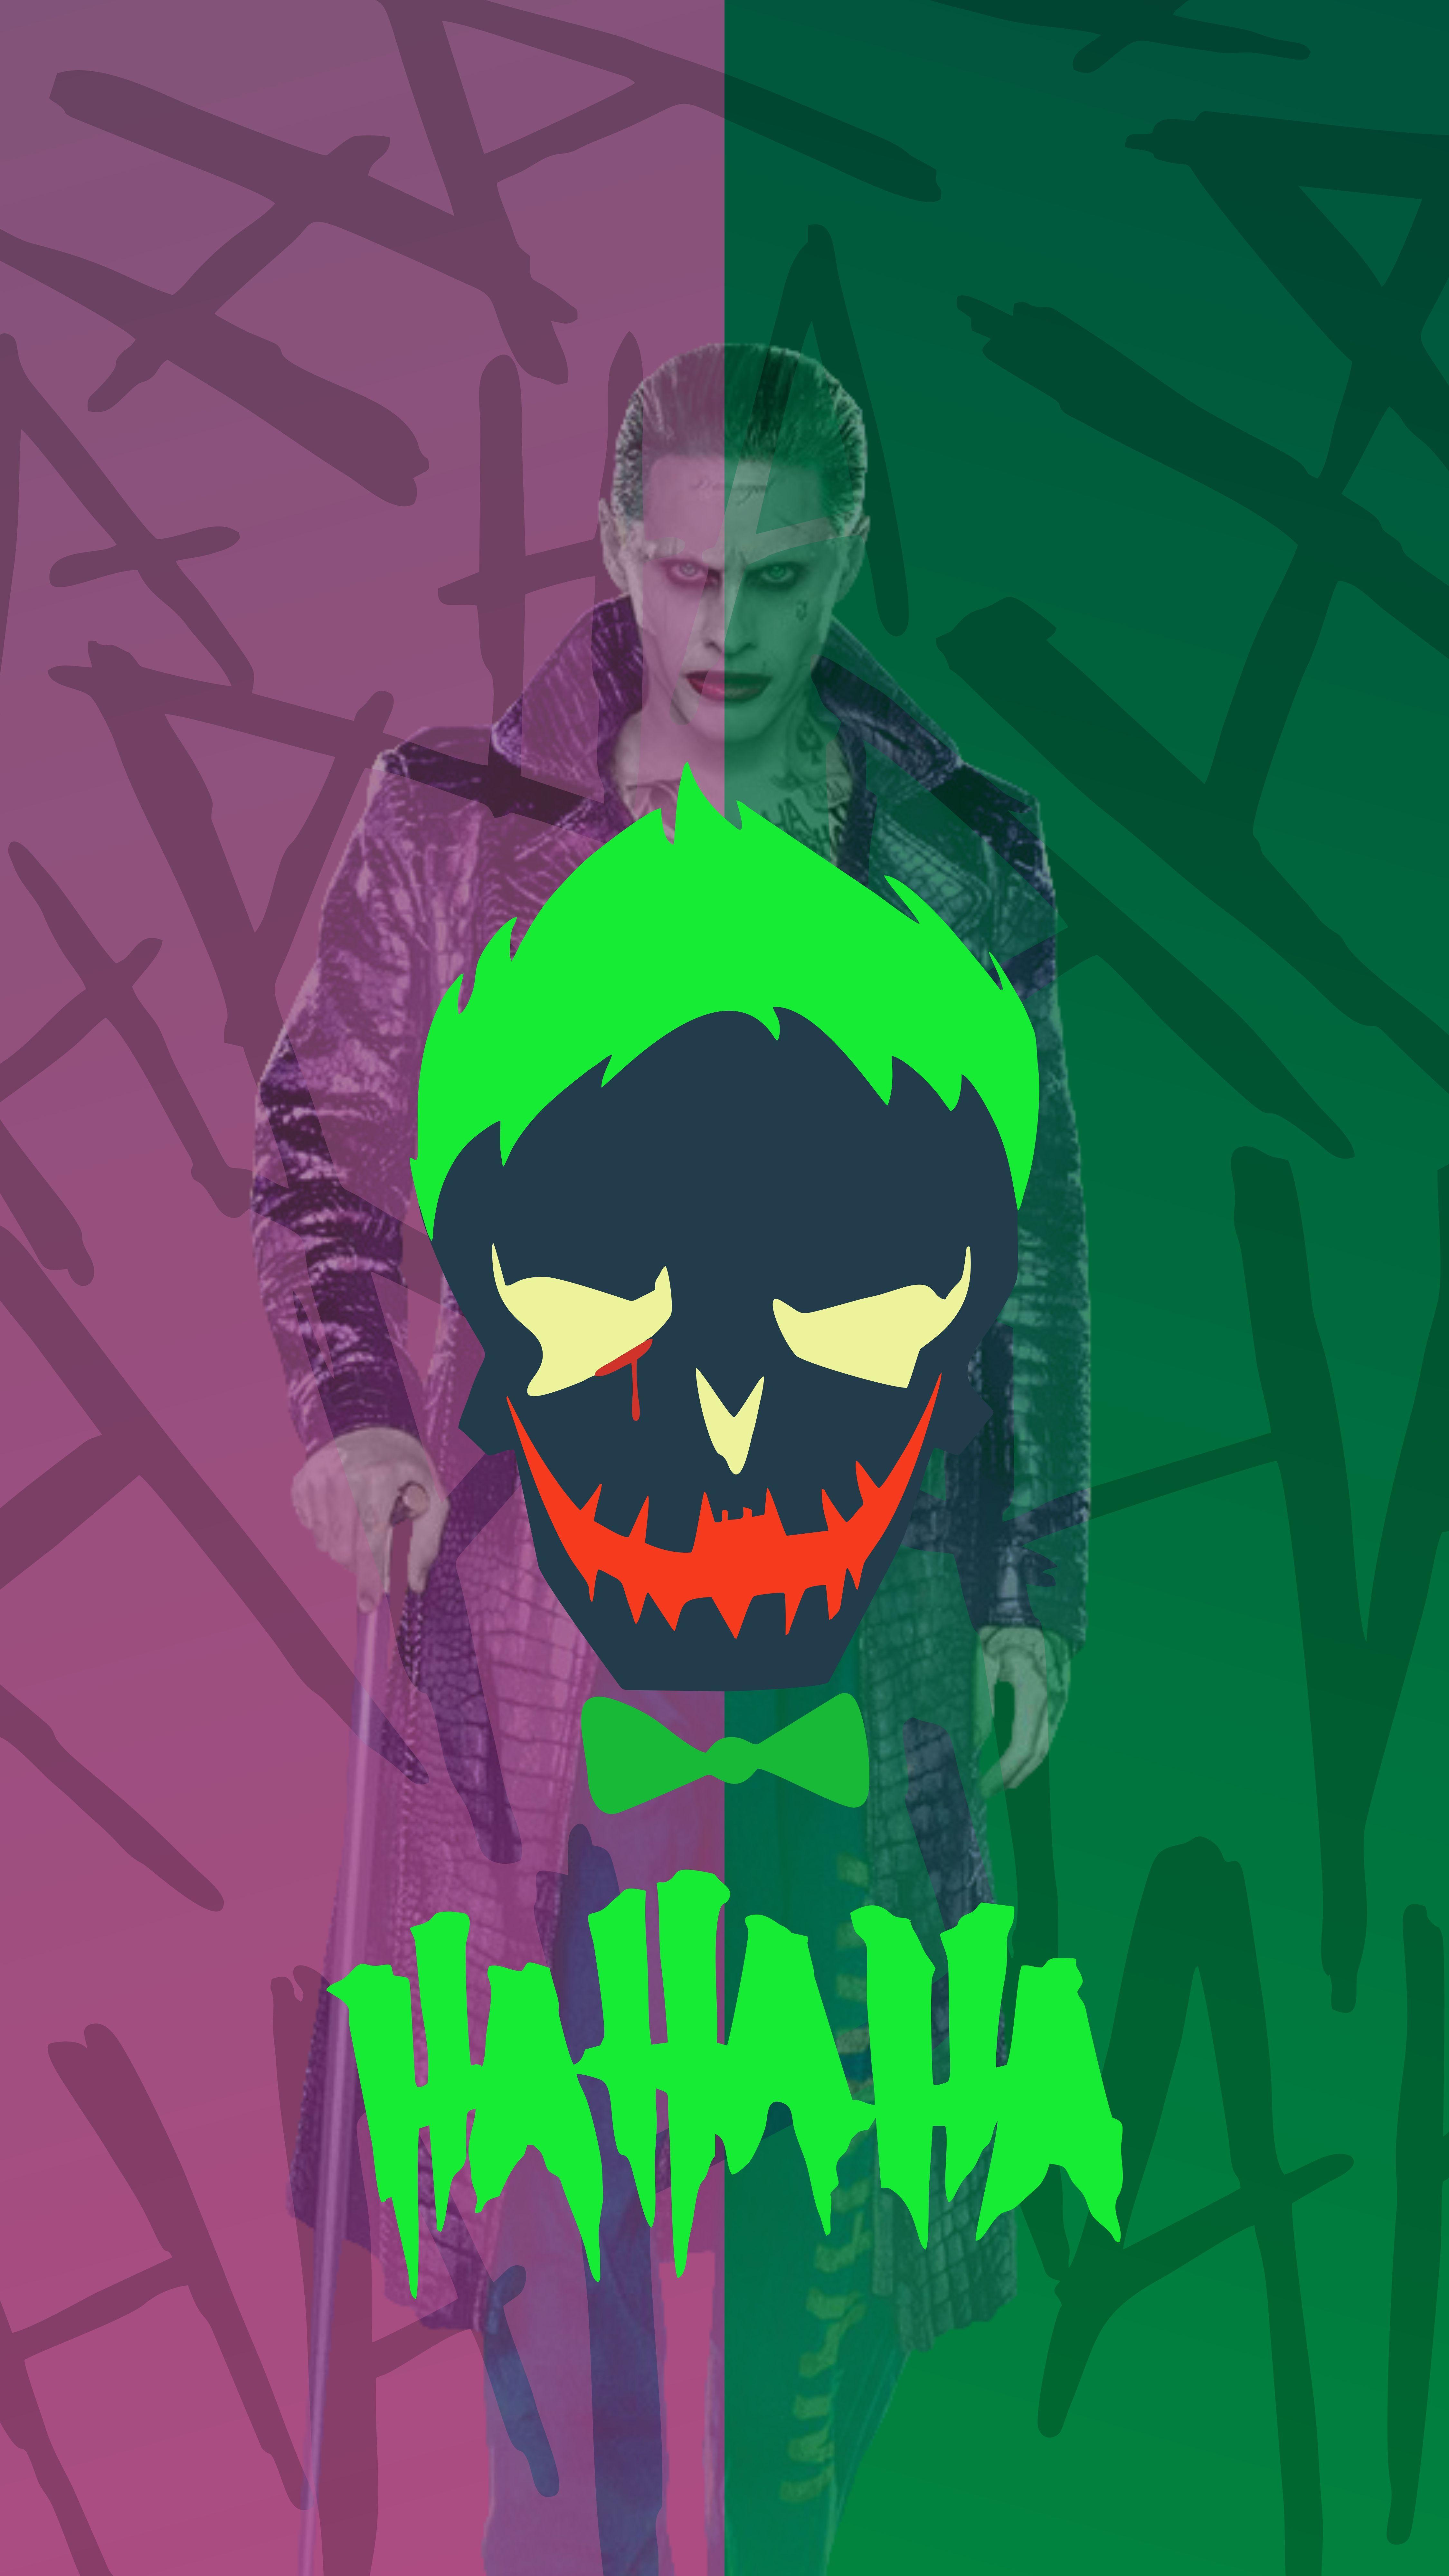 Wallpaper Hd Android Batman Joker